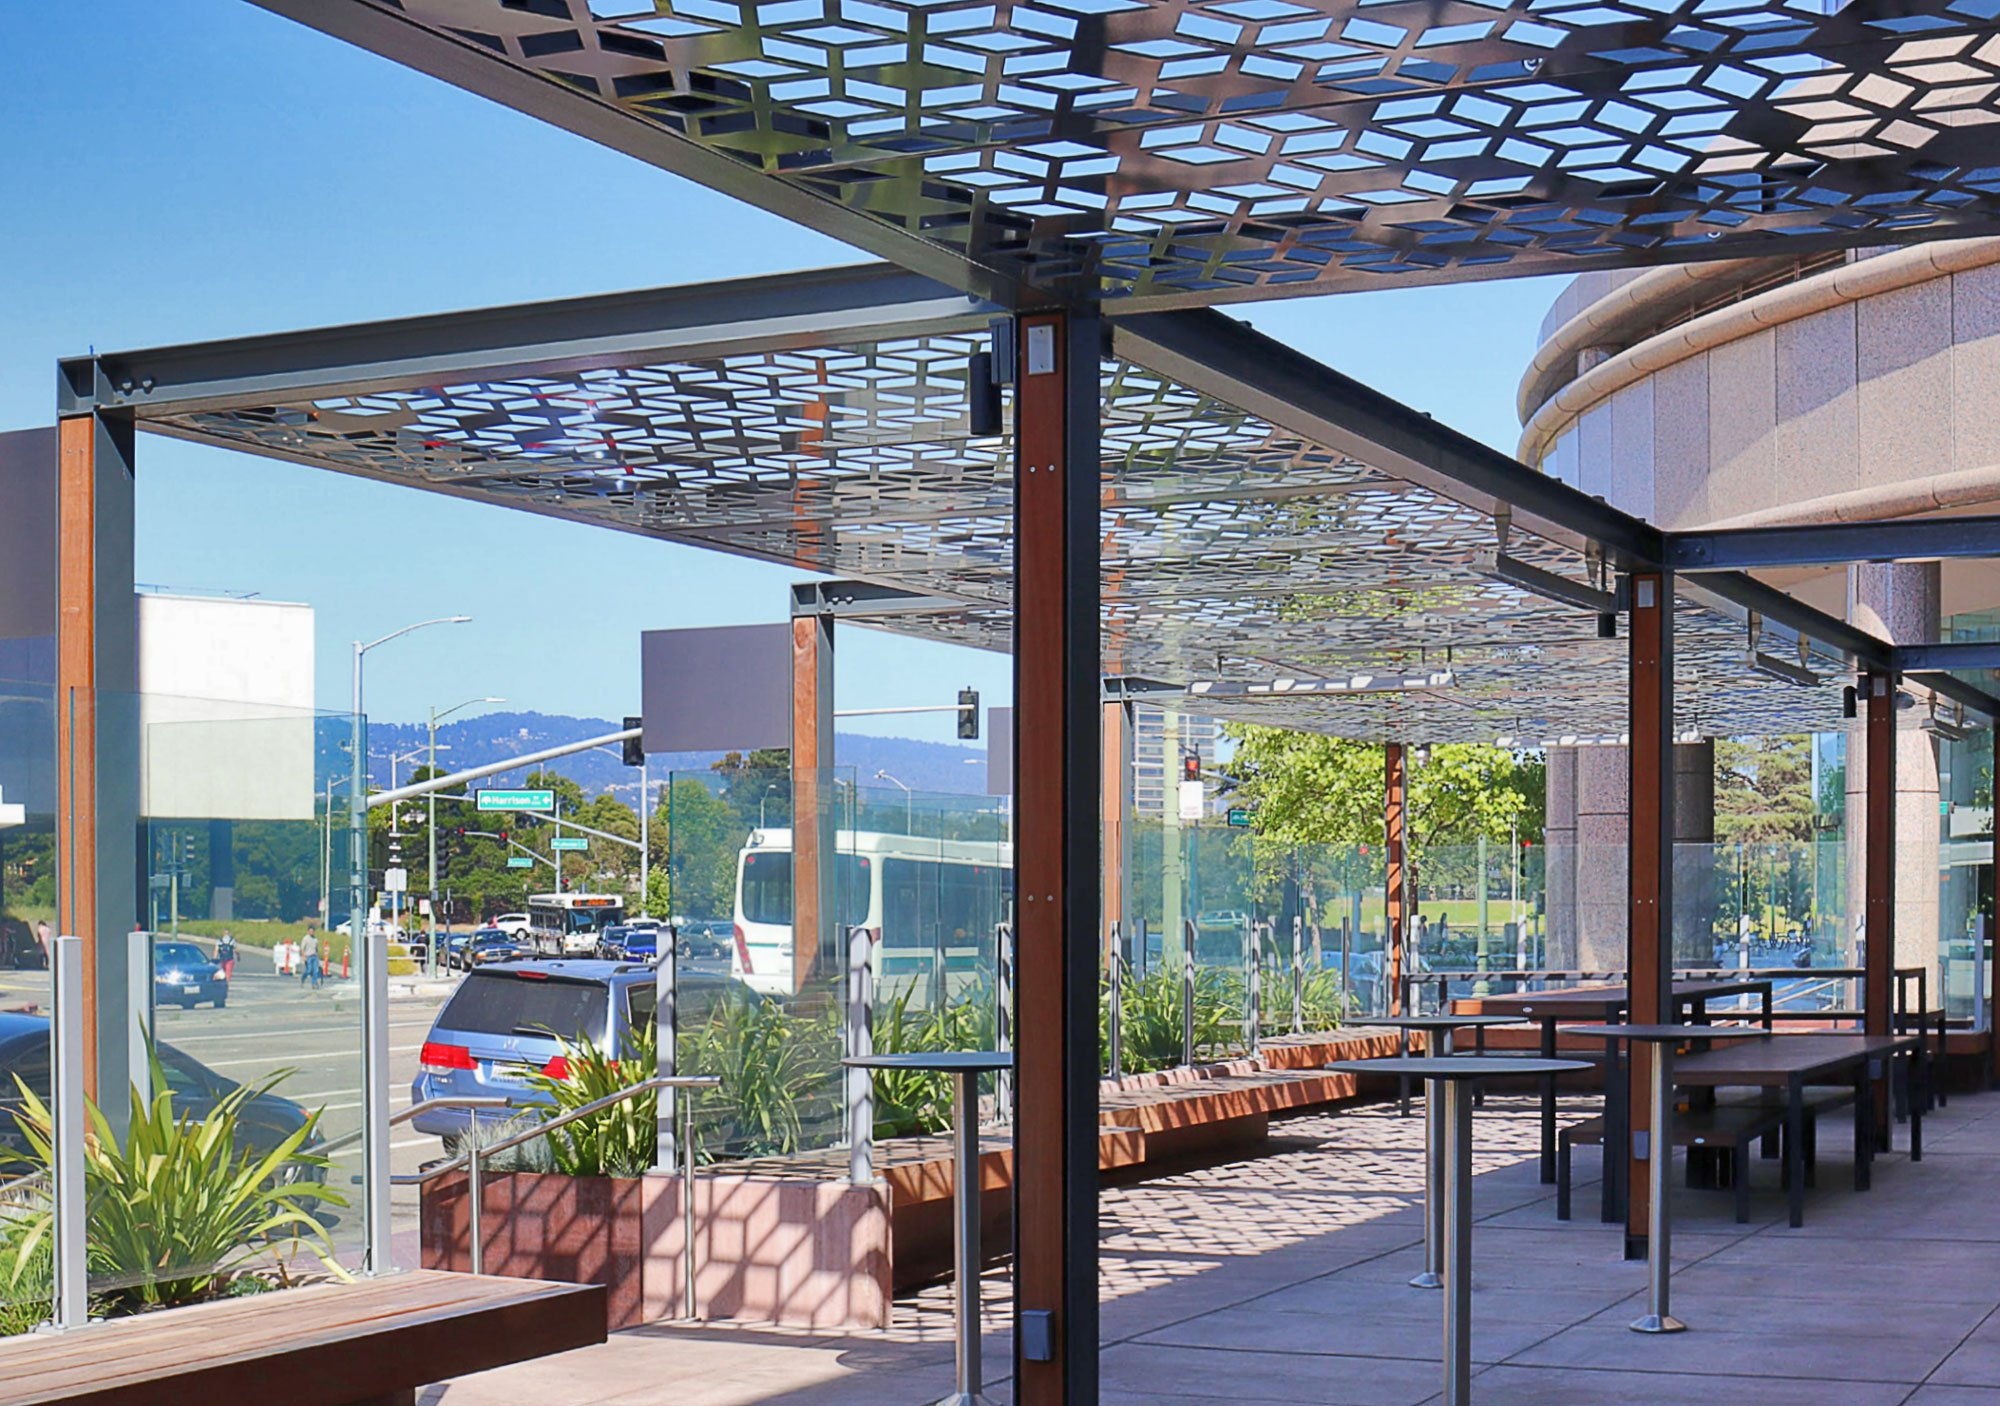 Lake Merritt Plaza-Oakland, CA-Lowney Architecture-5